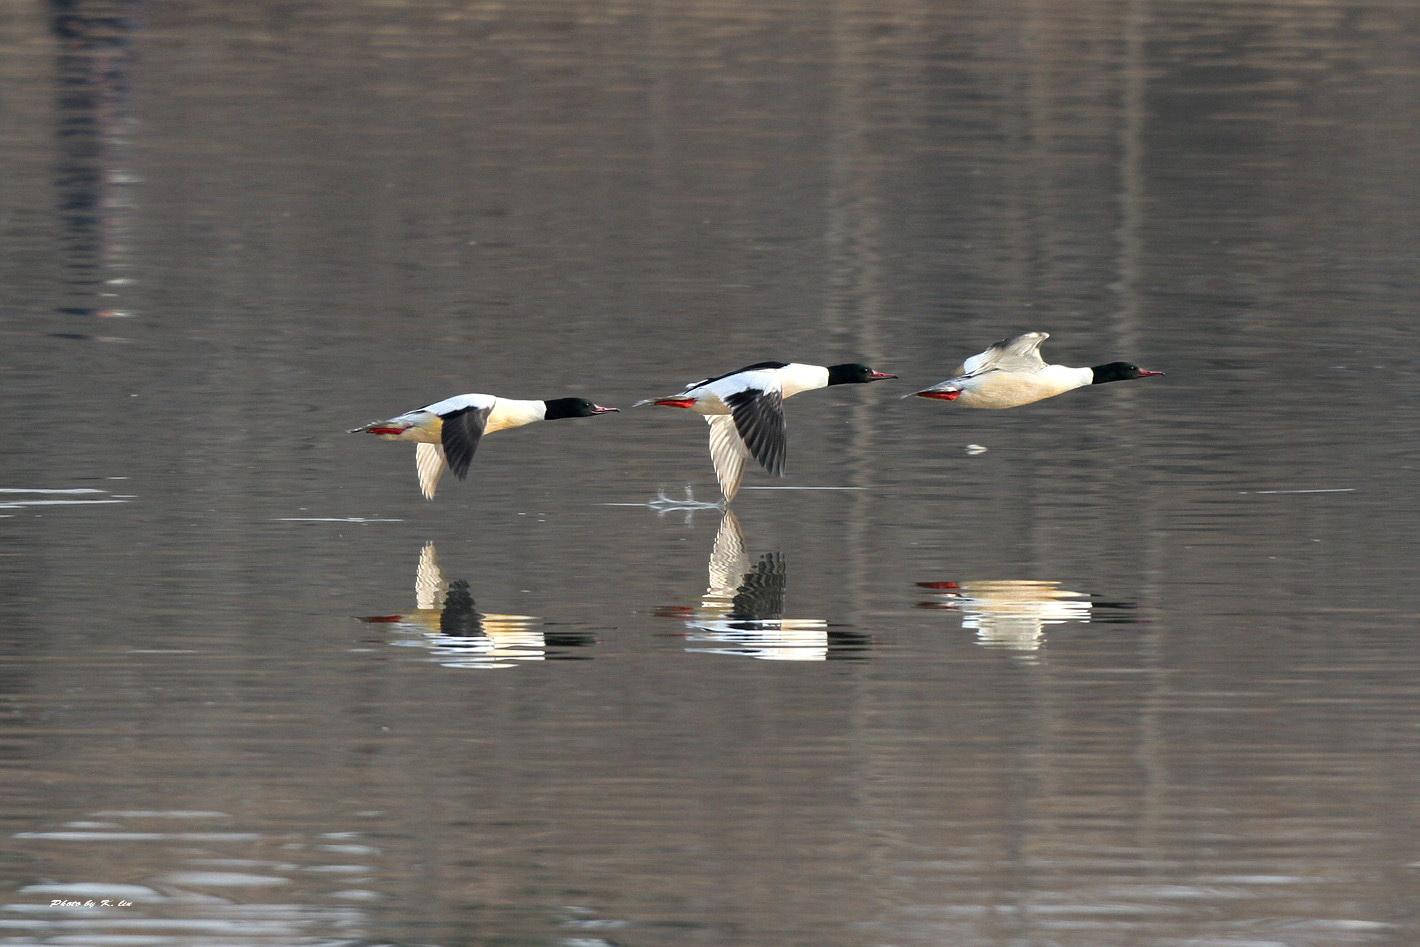 川秋沙 Common Merganser (雄成鳥)